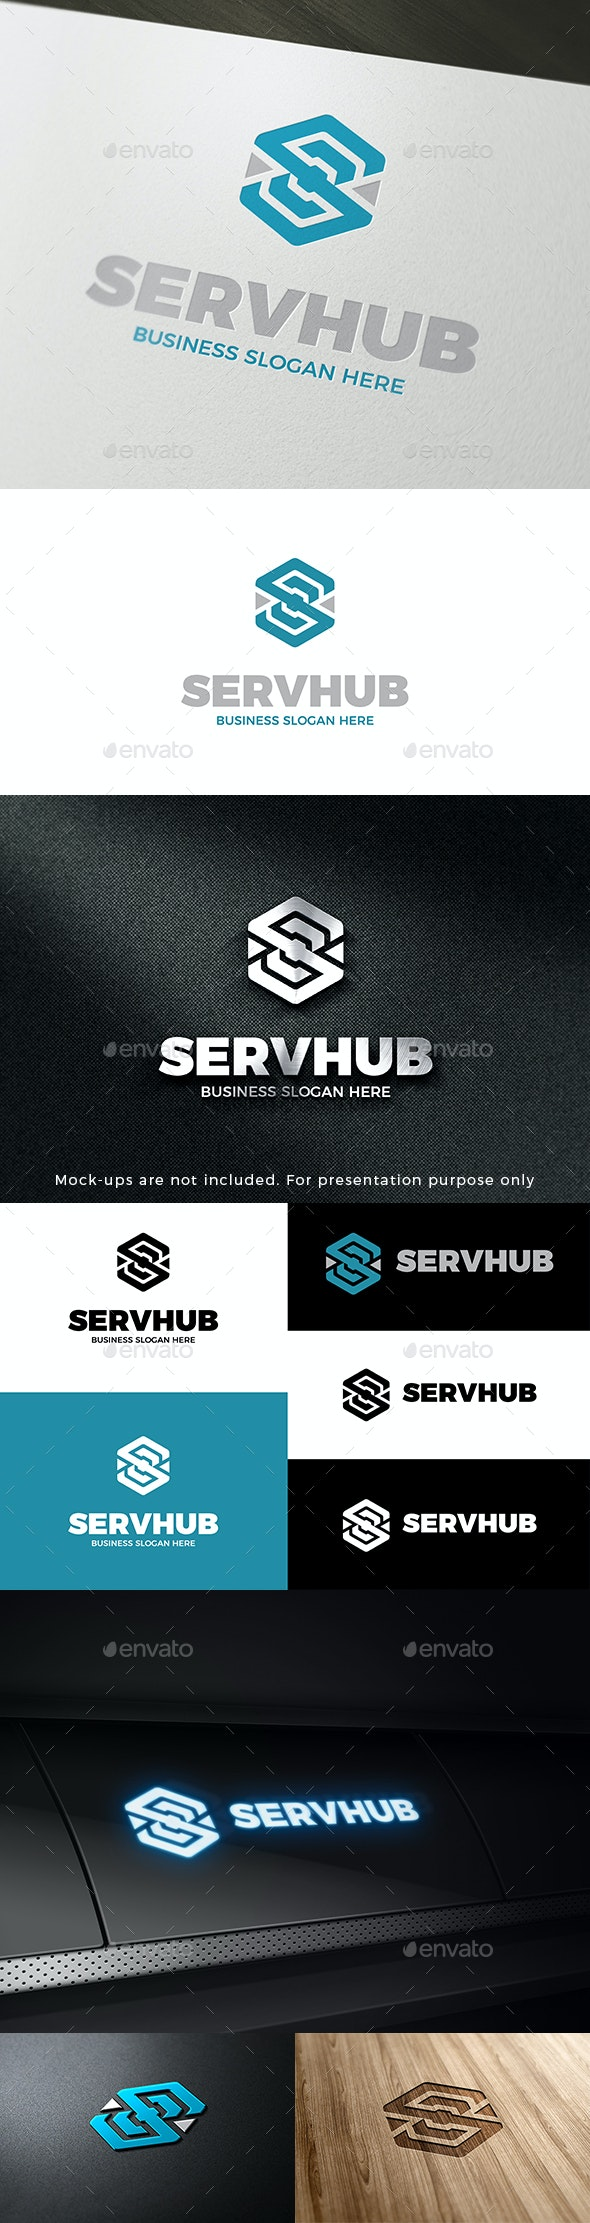 Serv Hub Abstract Cube S Symbol Logo - Abstract Logo Templates